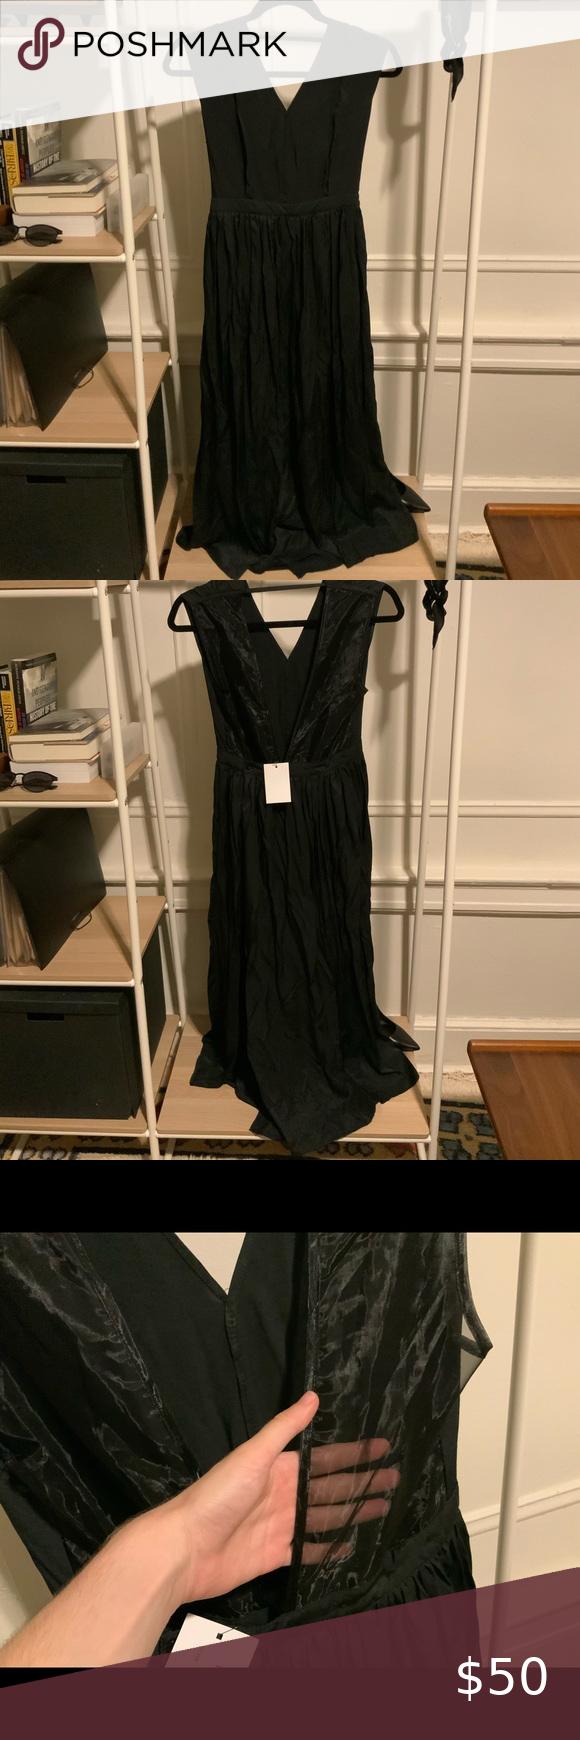 Oak And Fort Black Maxi Dresss Black Maxi Black Dress Formal Going Out Dresses [ 1740 x 580 Pixel ]